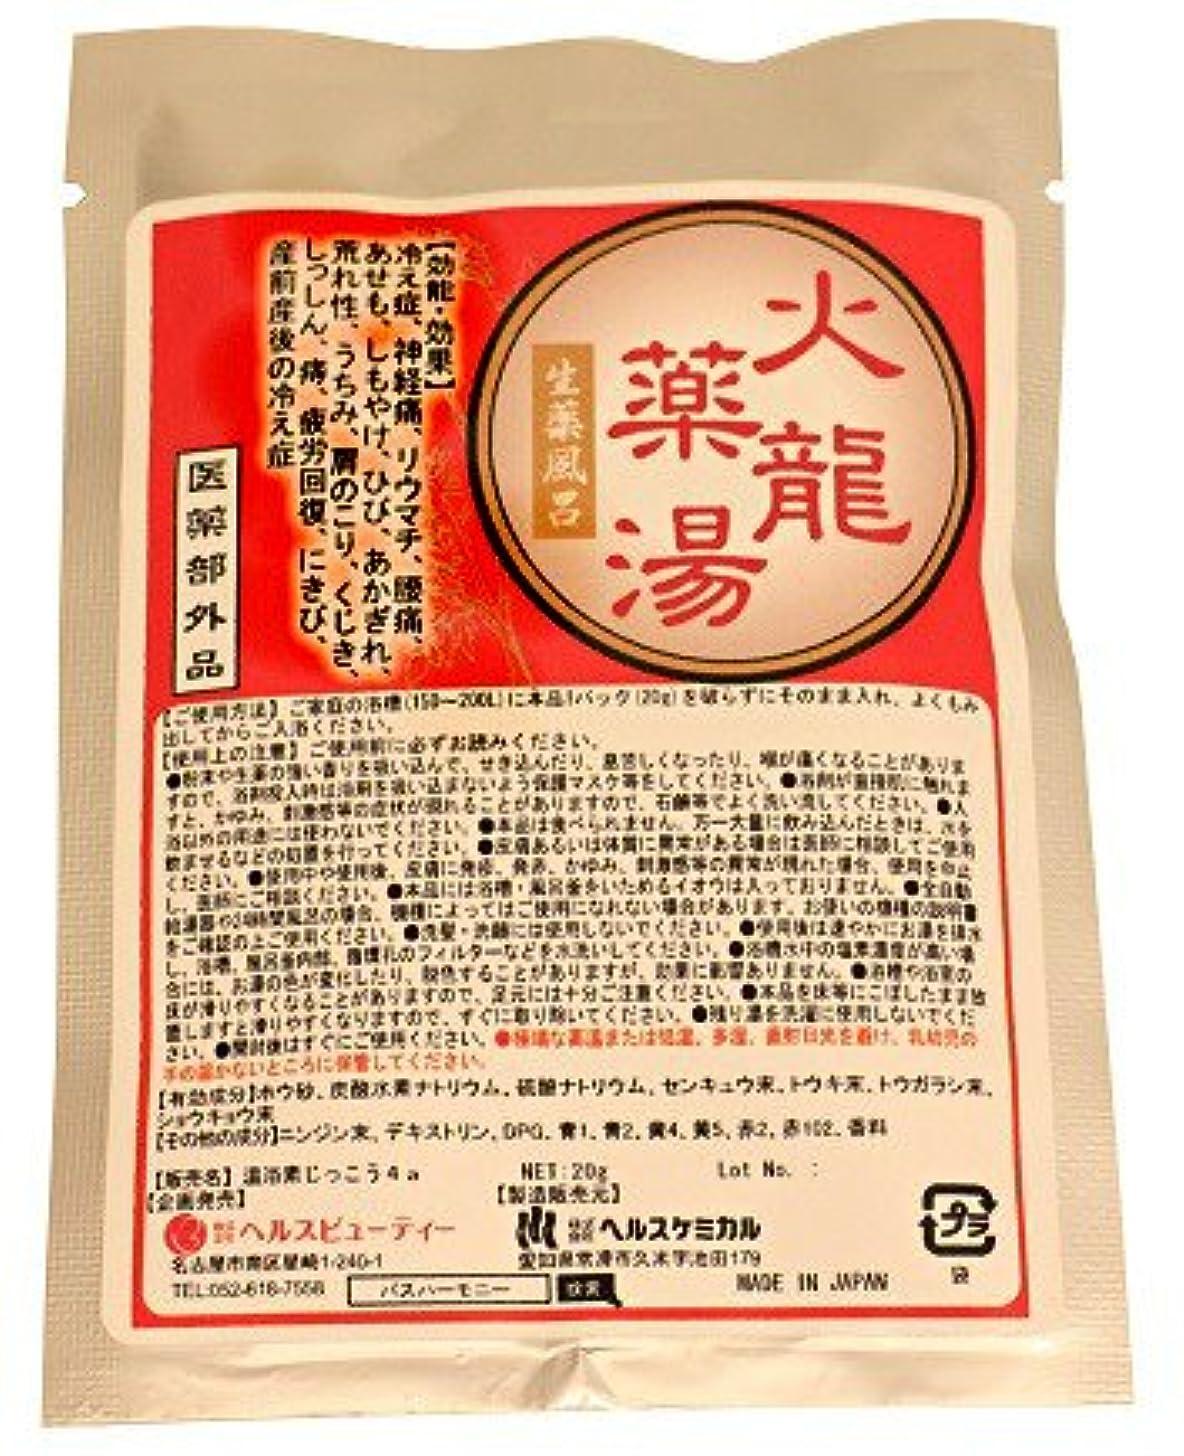 飲料会話適度な火龍 薬湯 分包 タイプ 1回分 生薬 薬湯 天然生薬 の 香り 医薬部外品